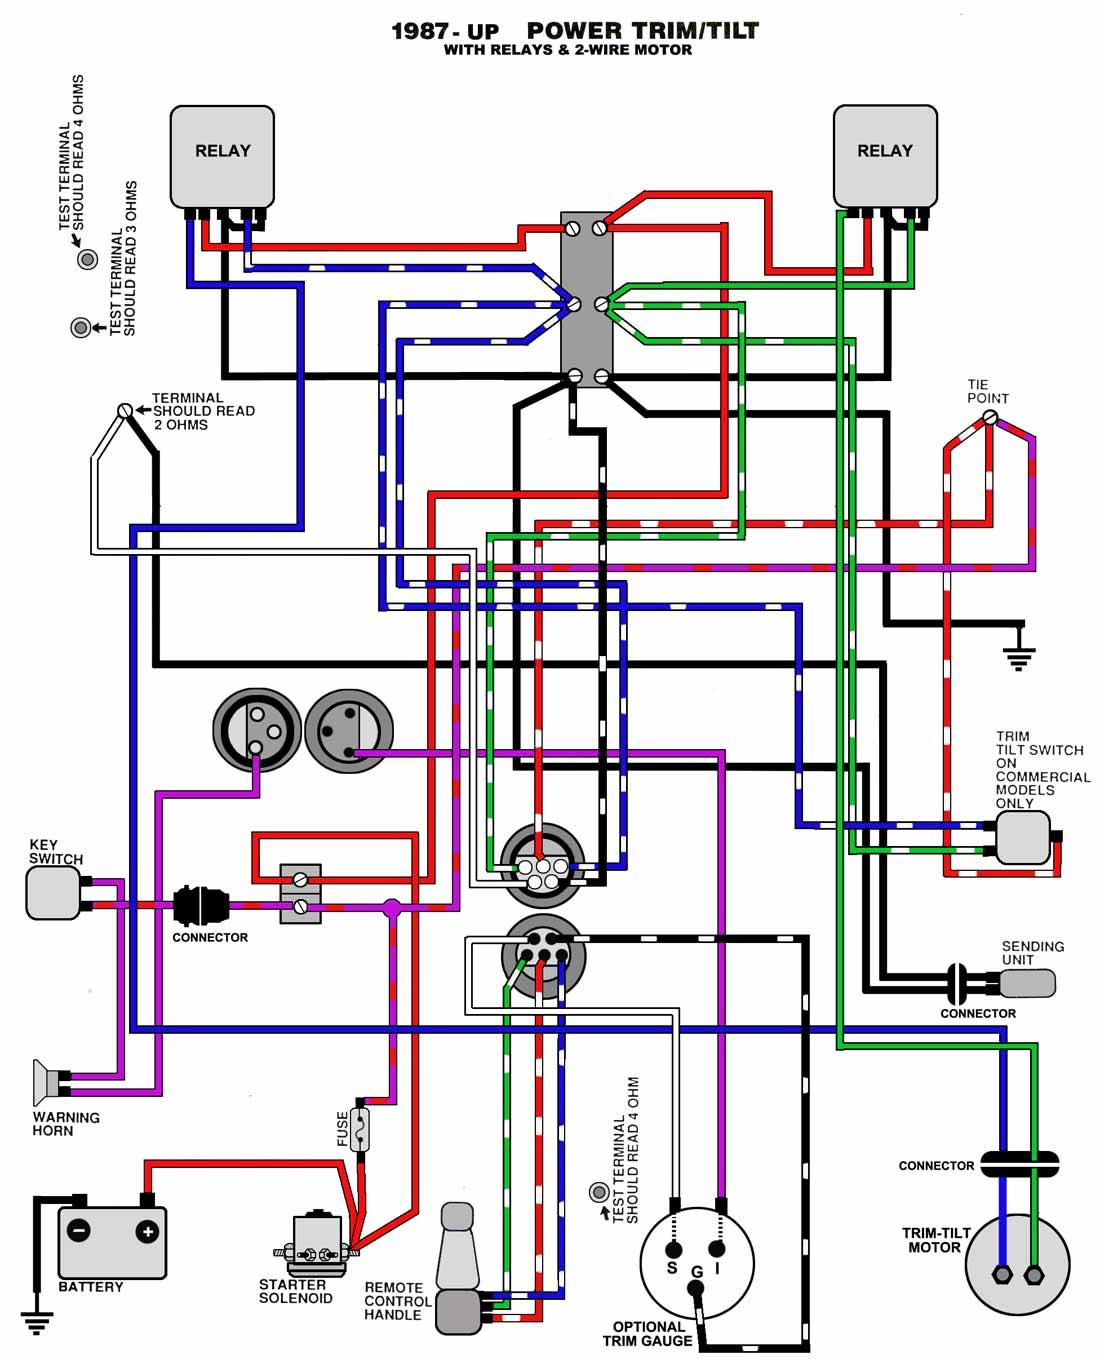 TnT_87_UP?resize=665%2C822 yamaha outboard motor wiring diagrams the wiring diagram yamaha outboard digital gauges wiring diagram at readyjetset.co